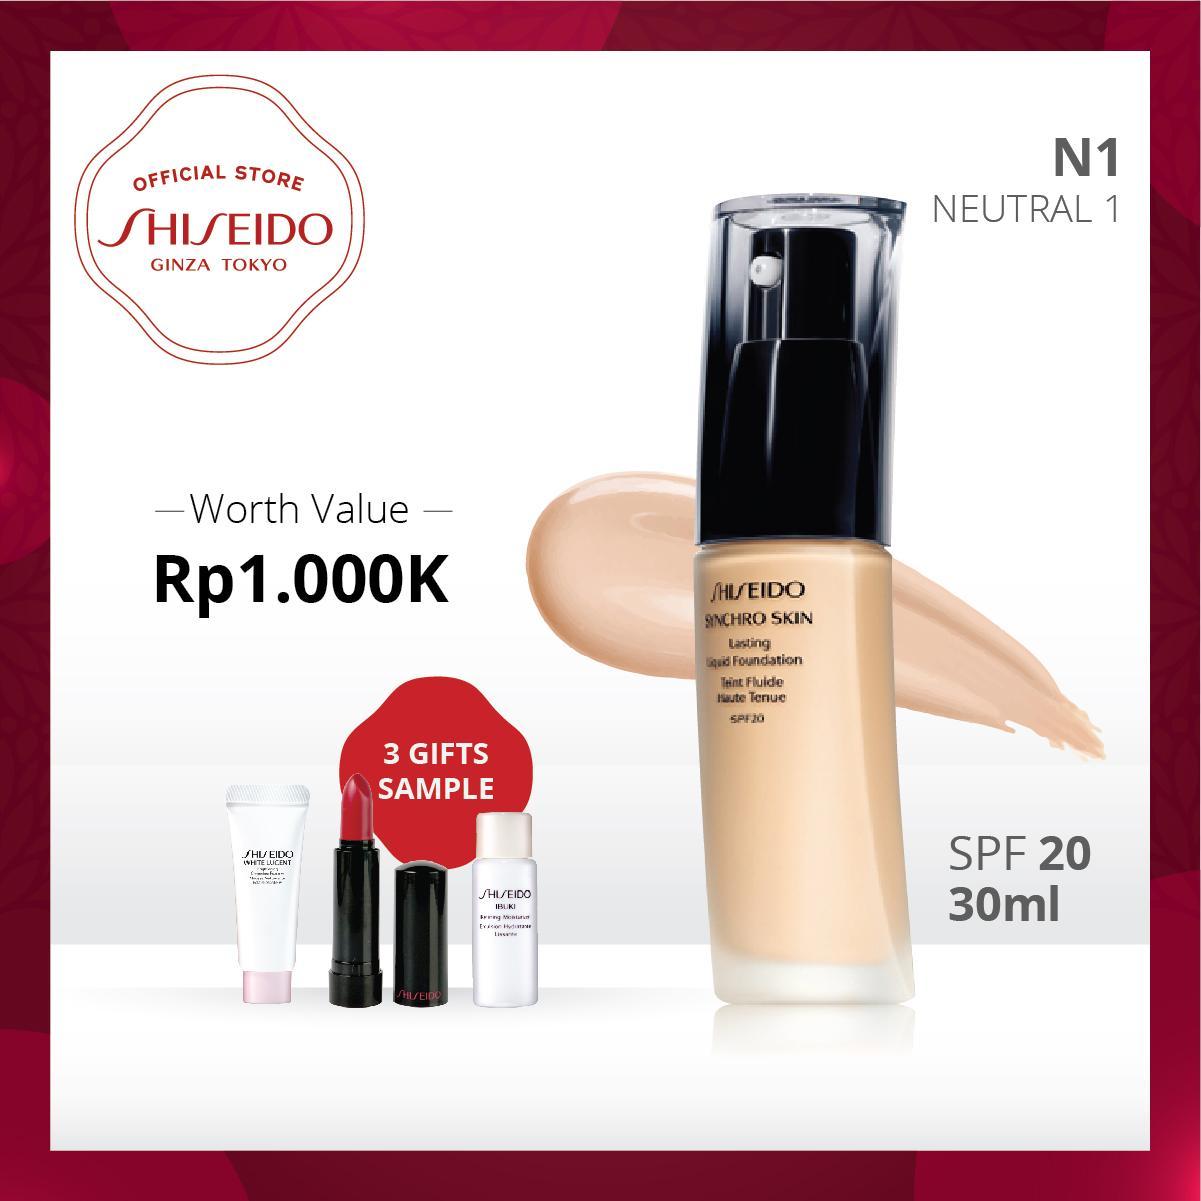 Shiseido Ramadhan Promo Synchro Skin Lasting Liquid Foundation 30mL Makeup Series